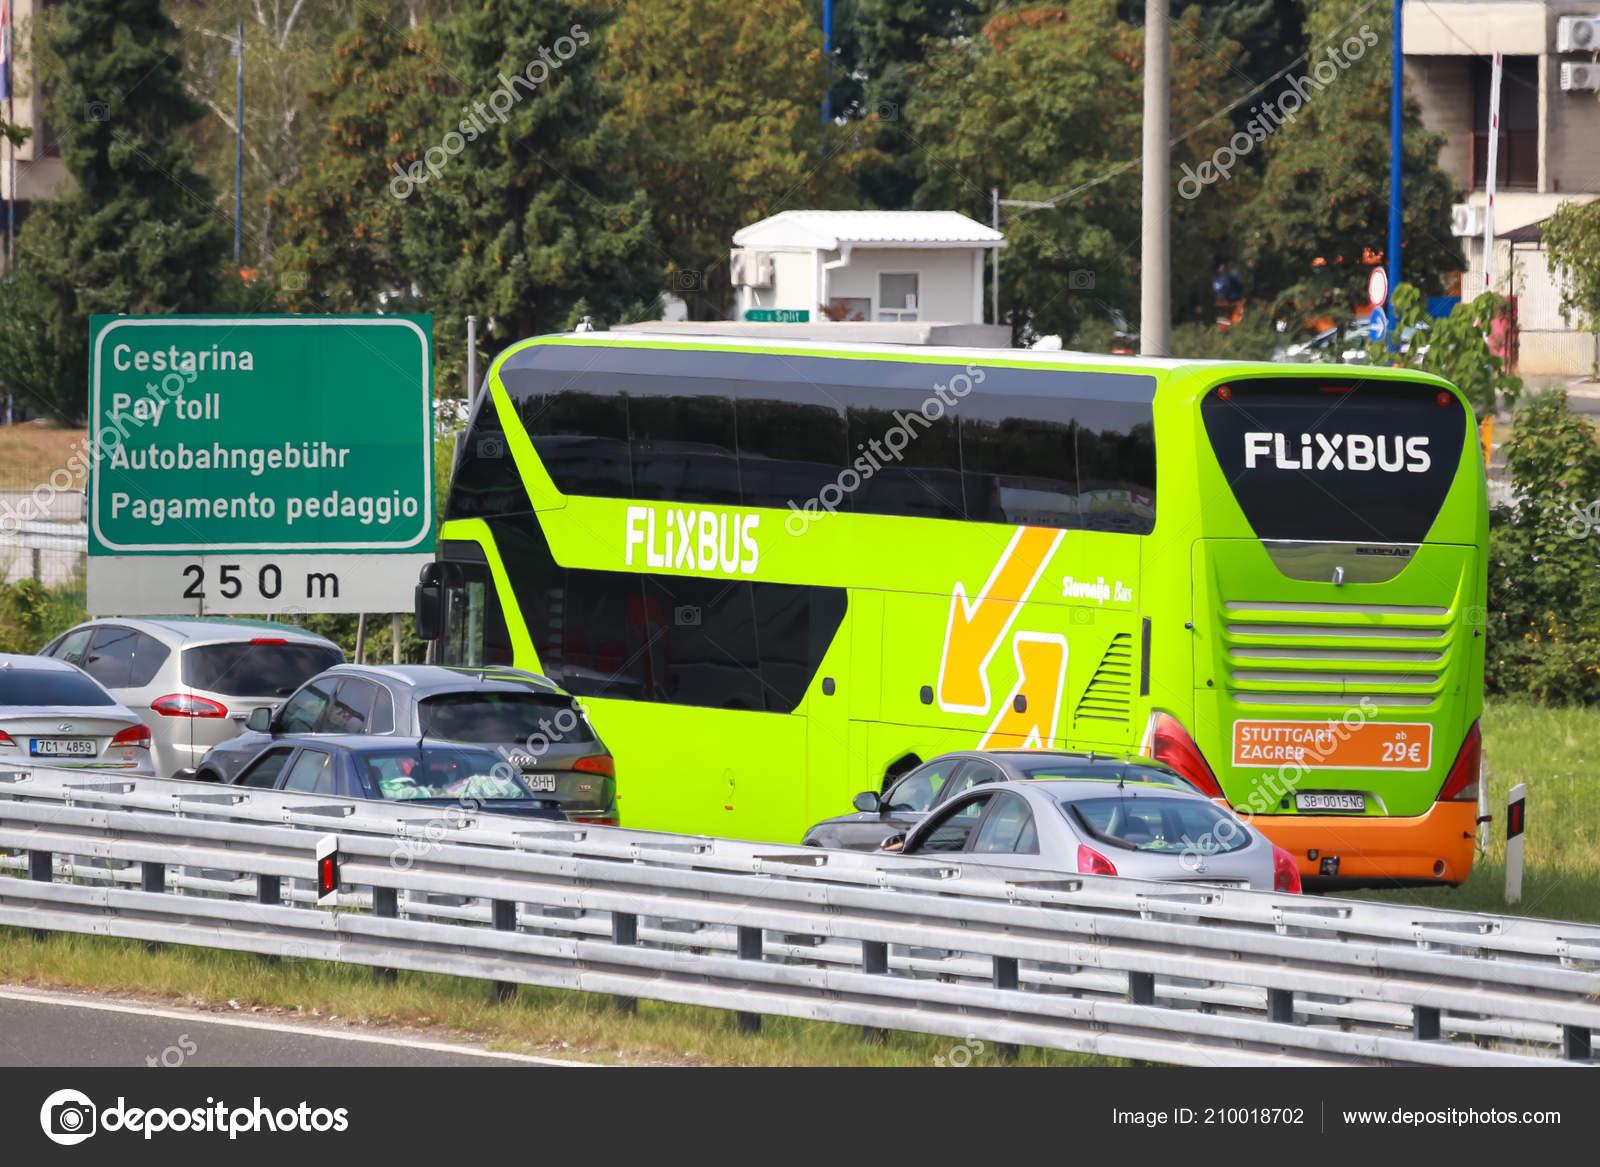 Zagreb Croatia August 11th 2018 Green Bus Flixbus Company Stuck Stock Editorial Photo C Goranjakus 210018702